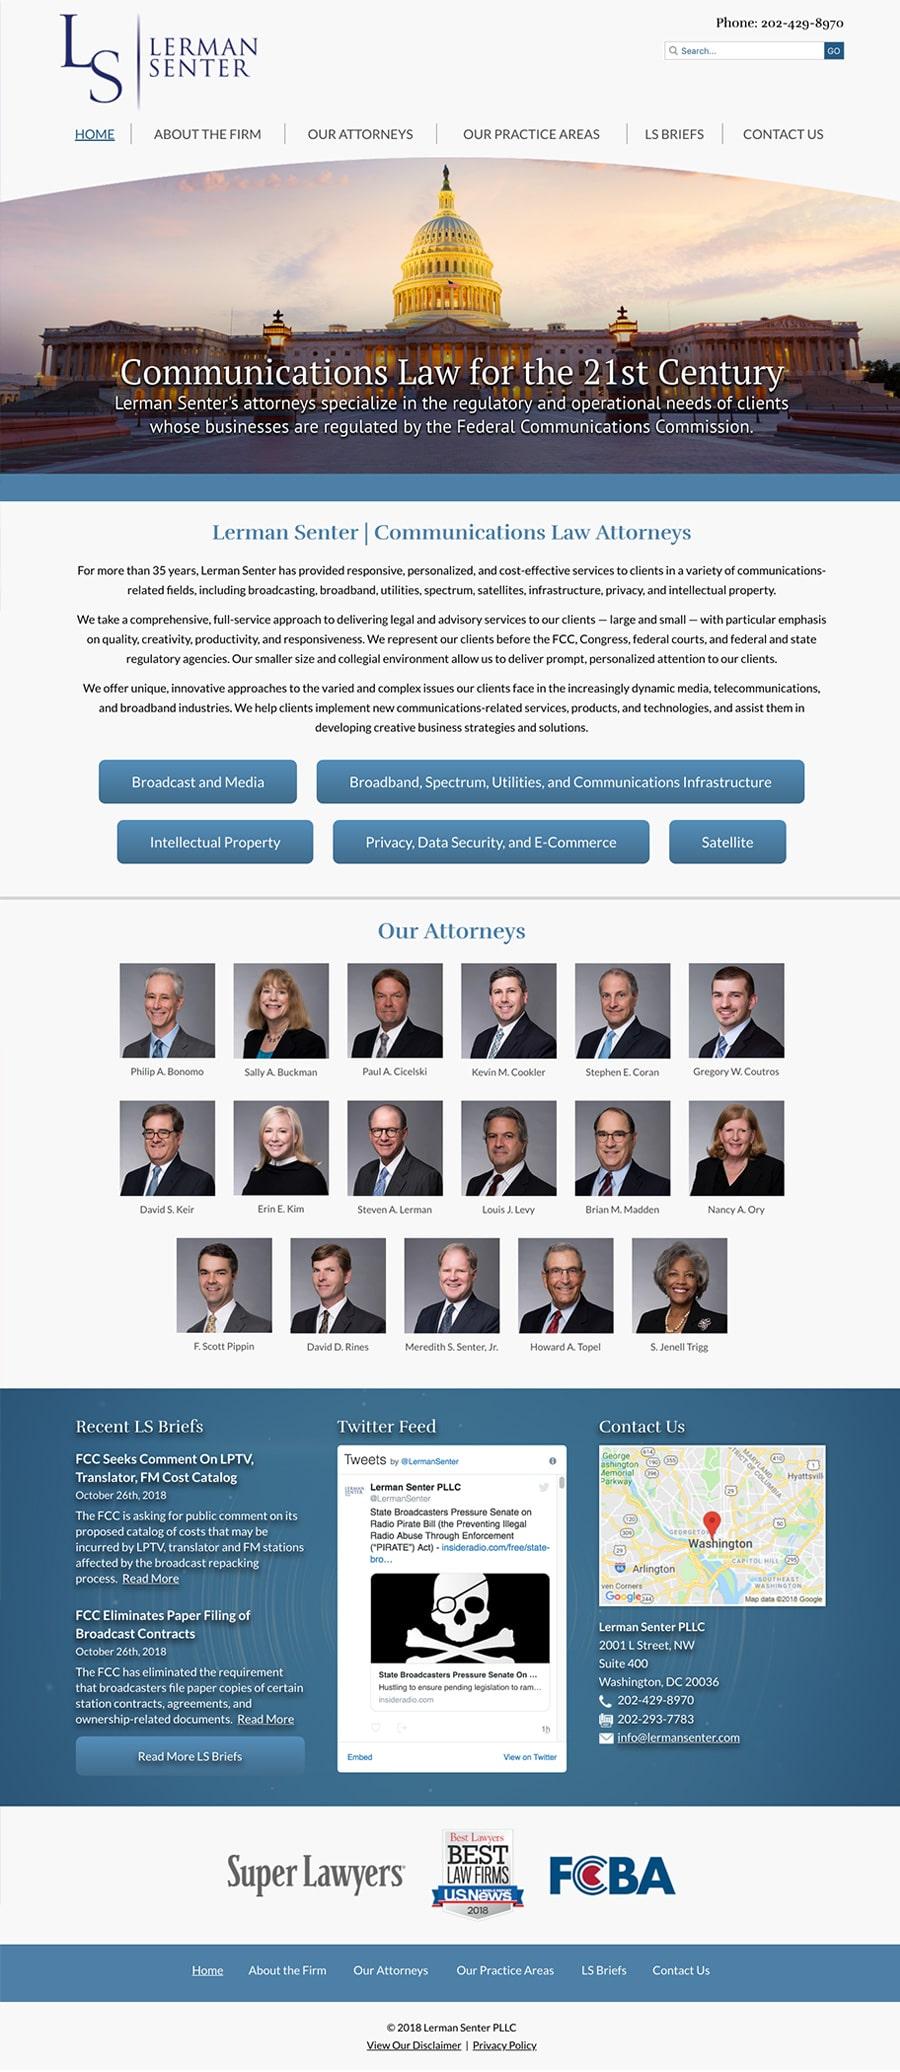 Law Firm Website Design for Lerman Senter PLLC